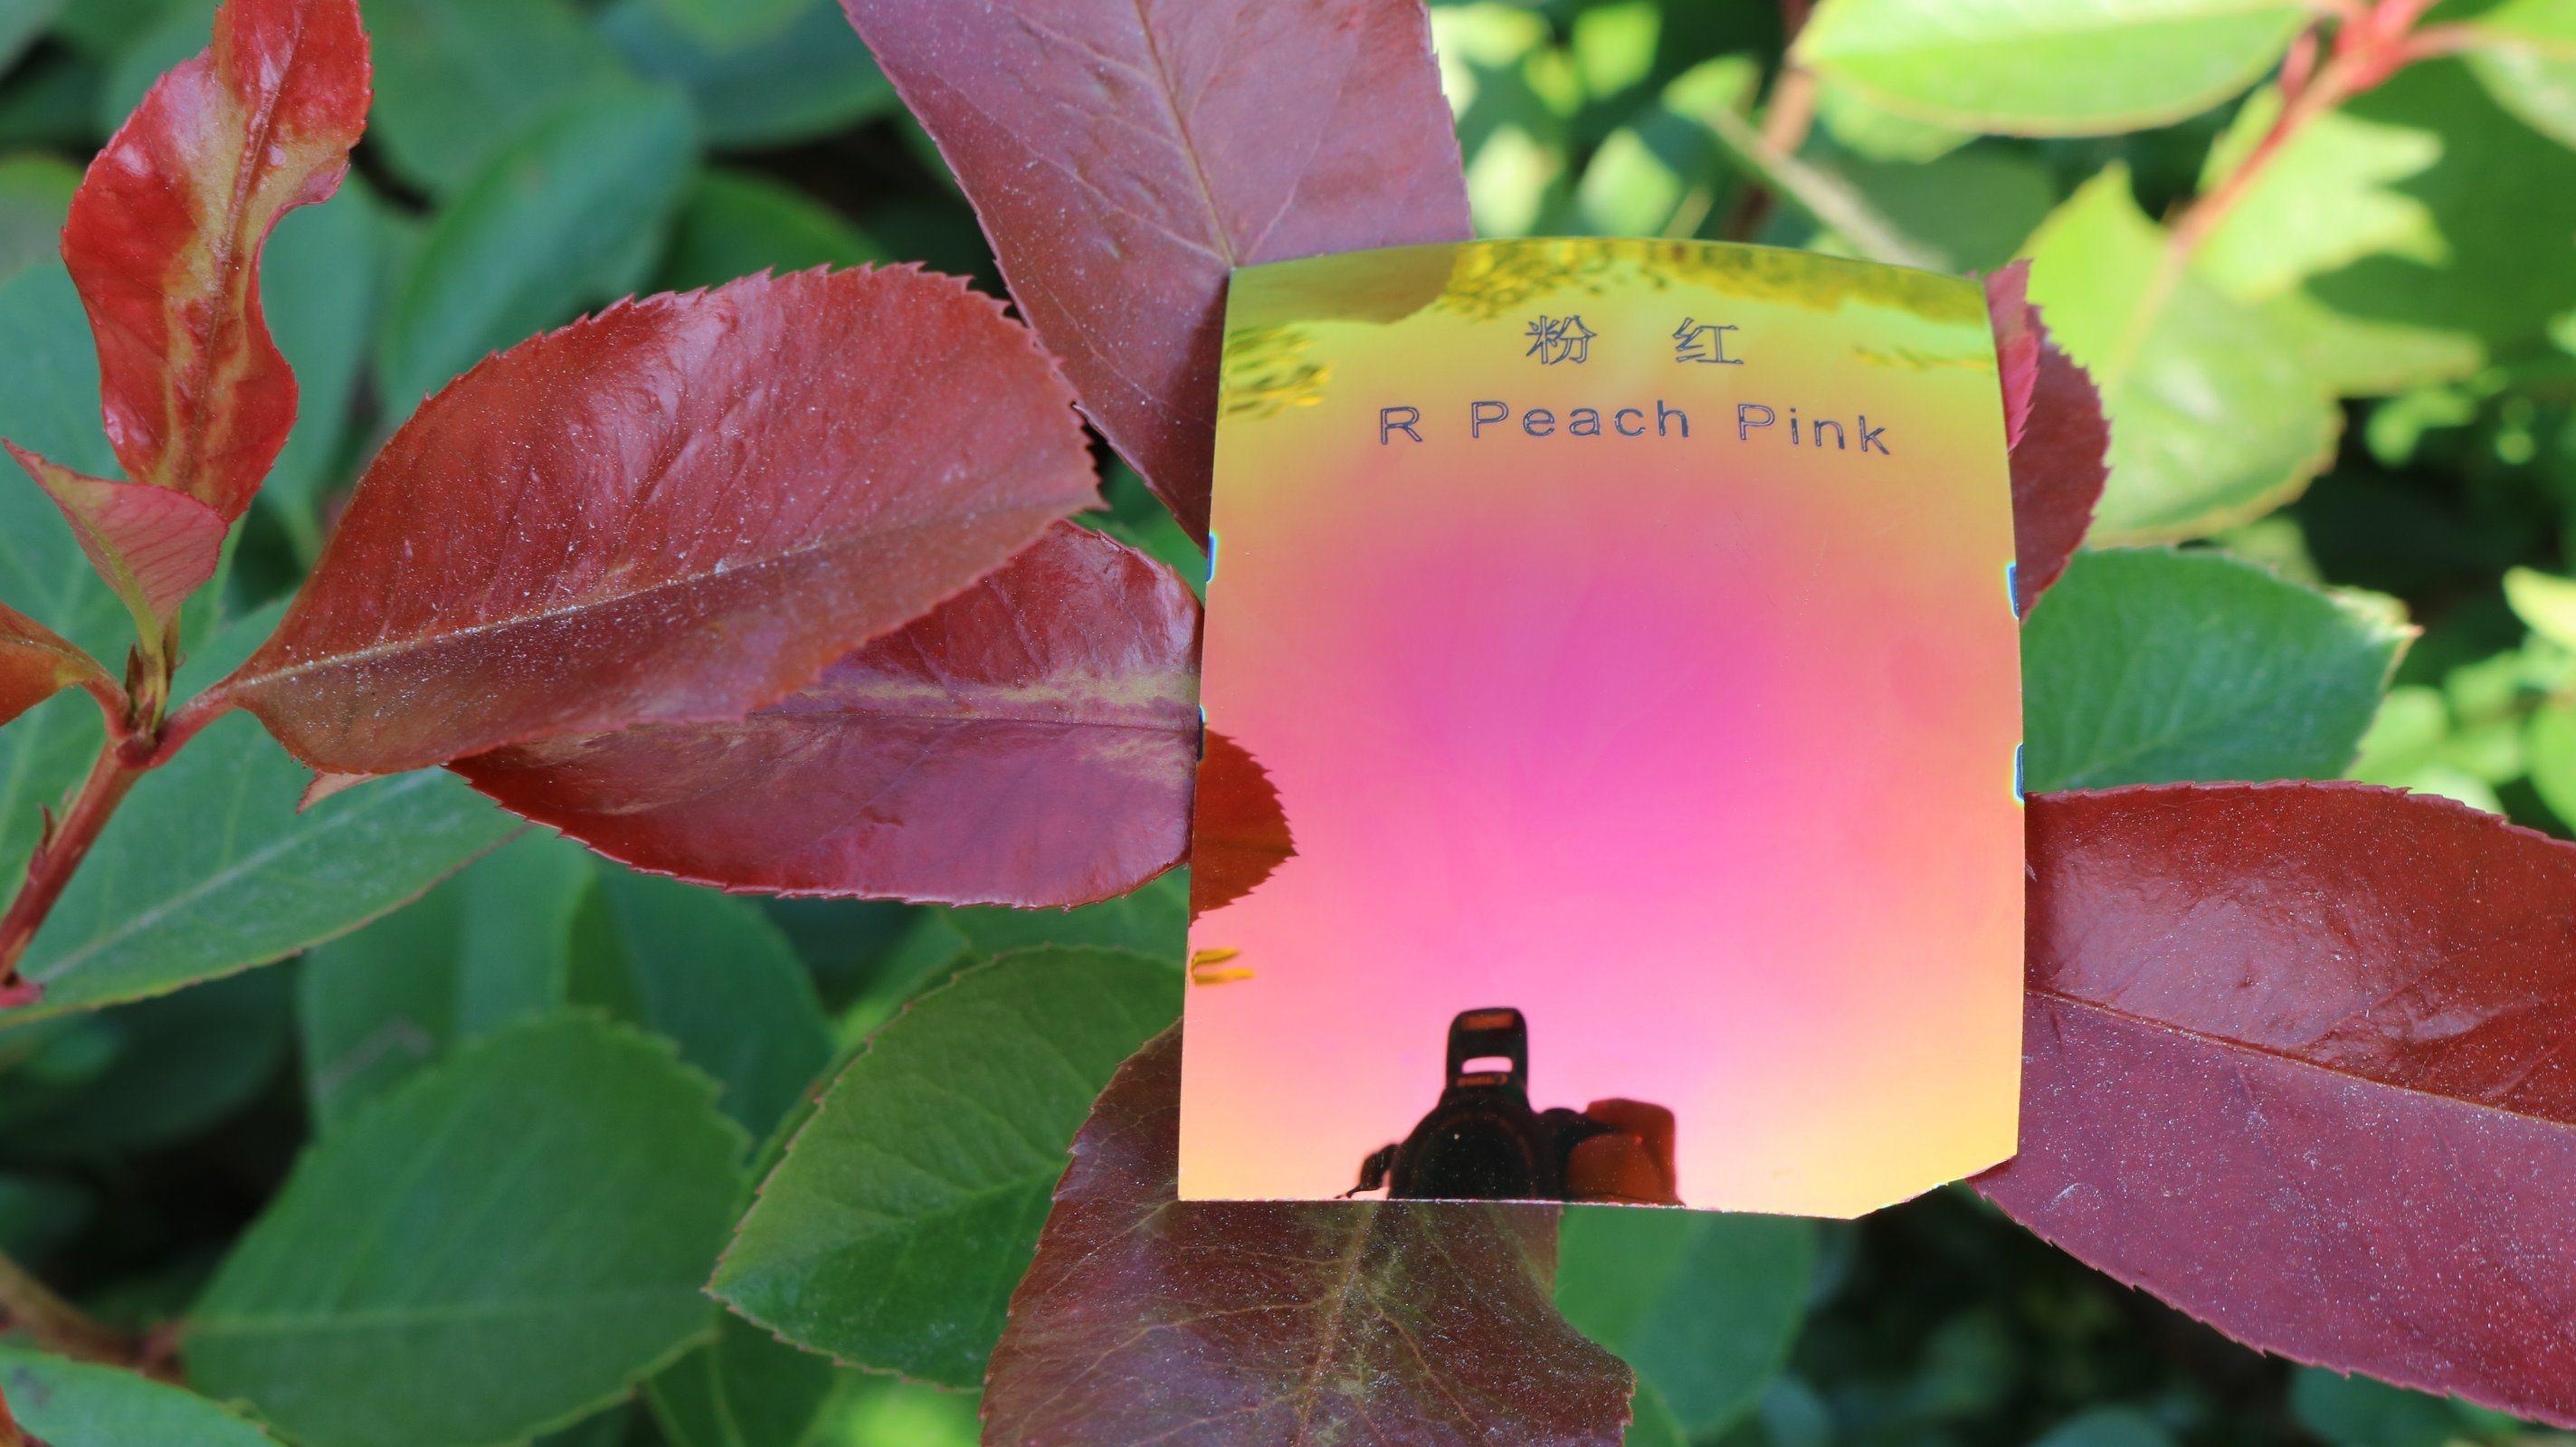 Colorful Sunglasses Polarized Tac Lens Repalcement Lens (R Peach Pink)